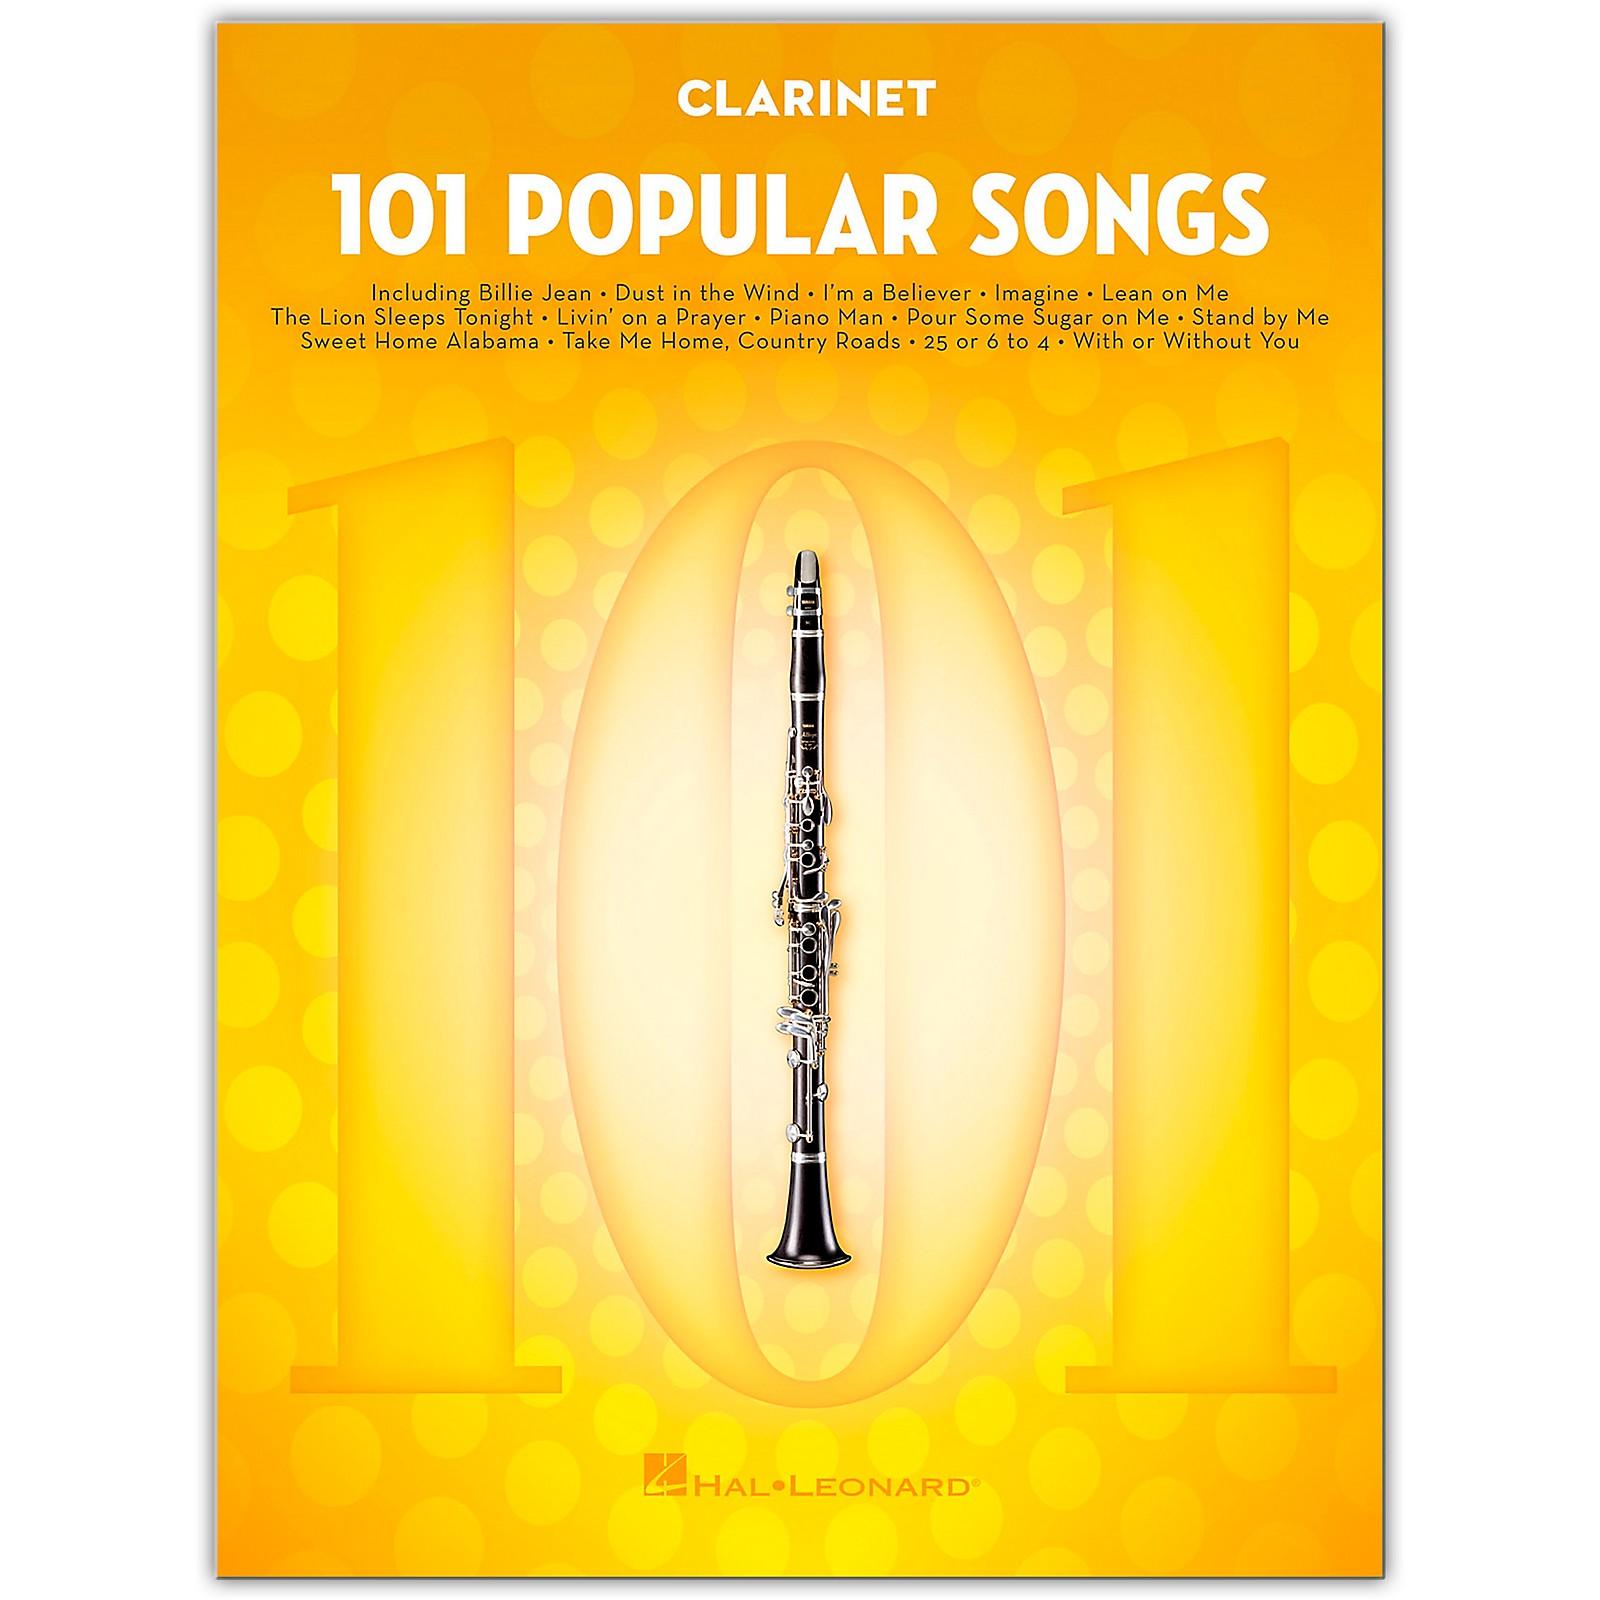 Hal Leonard 101 Popular Songs for Clarinet